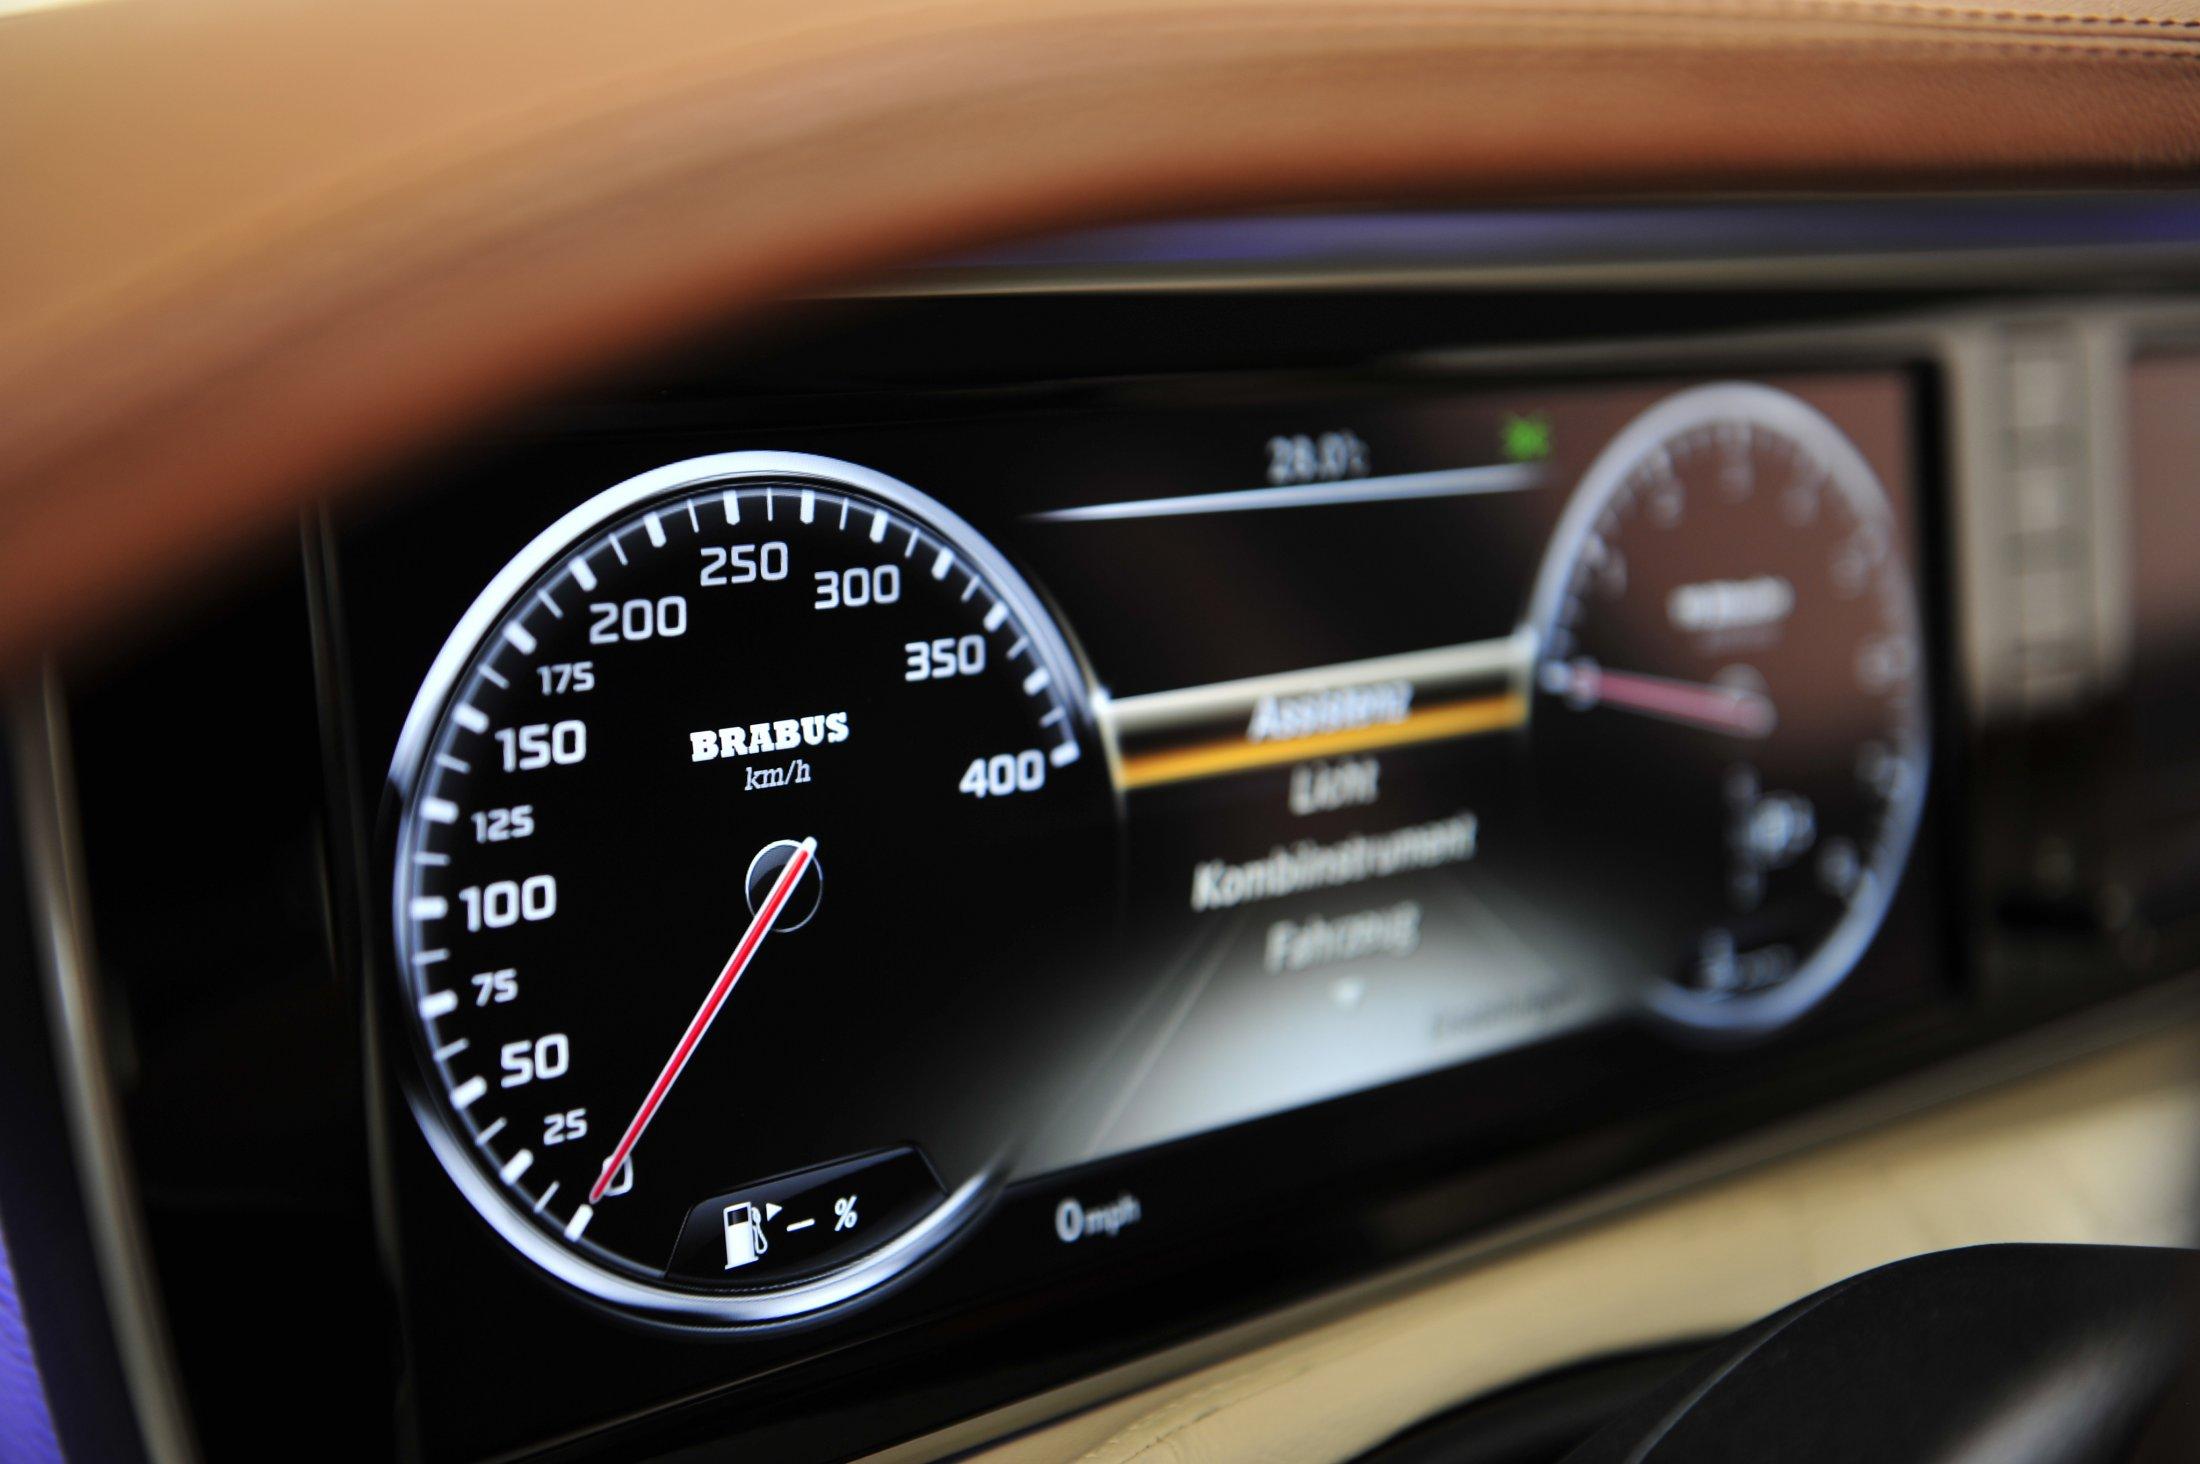 Mercedes-Benz Brabus 850 6.0 Biturbo IBusiness (1)